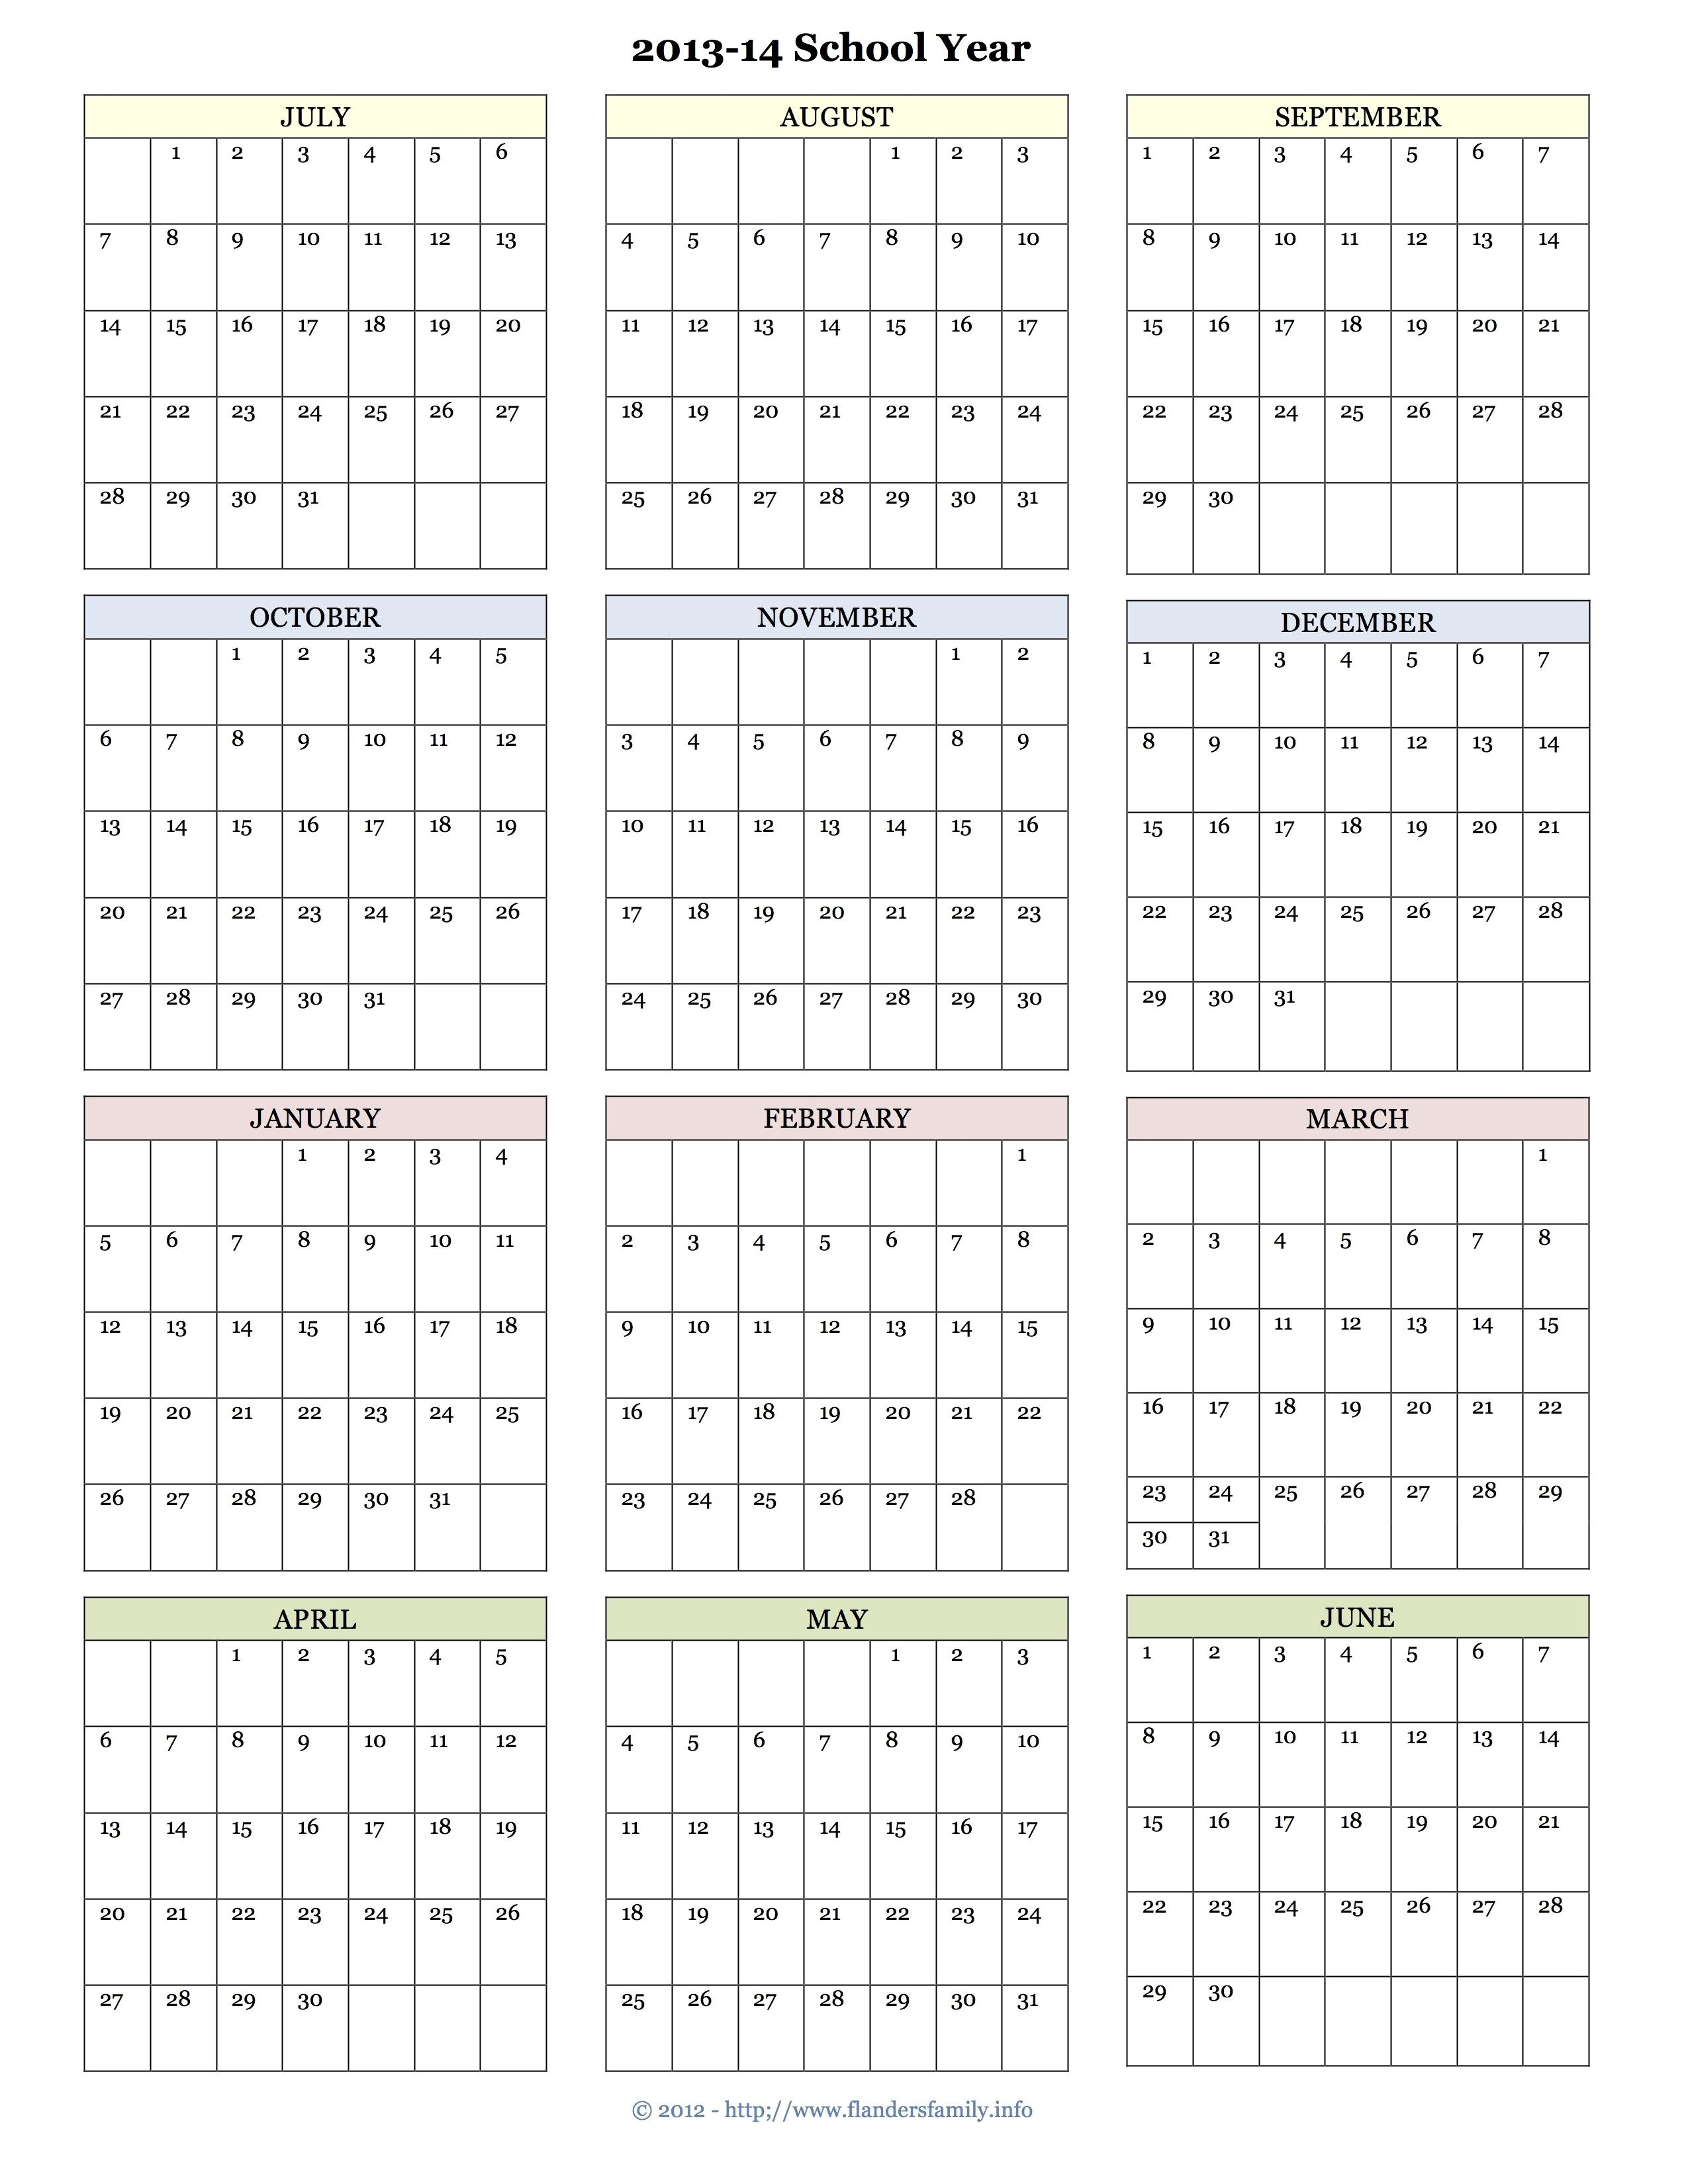 Depo Shot Calendar 2019 Depo Provera Injection Calendar 2018 Catch Print Calendar Calendar Printables School Calendar